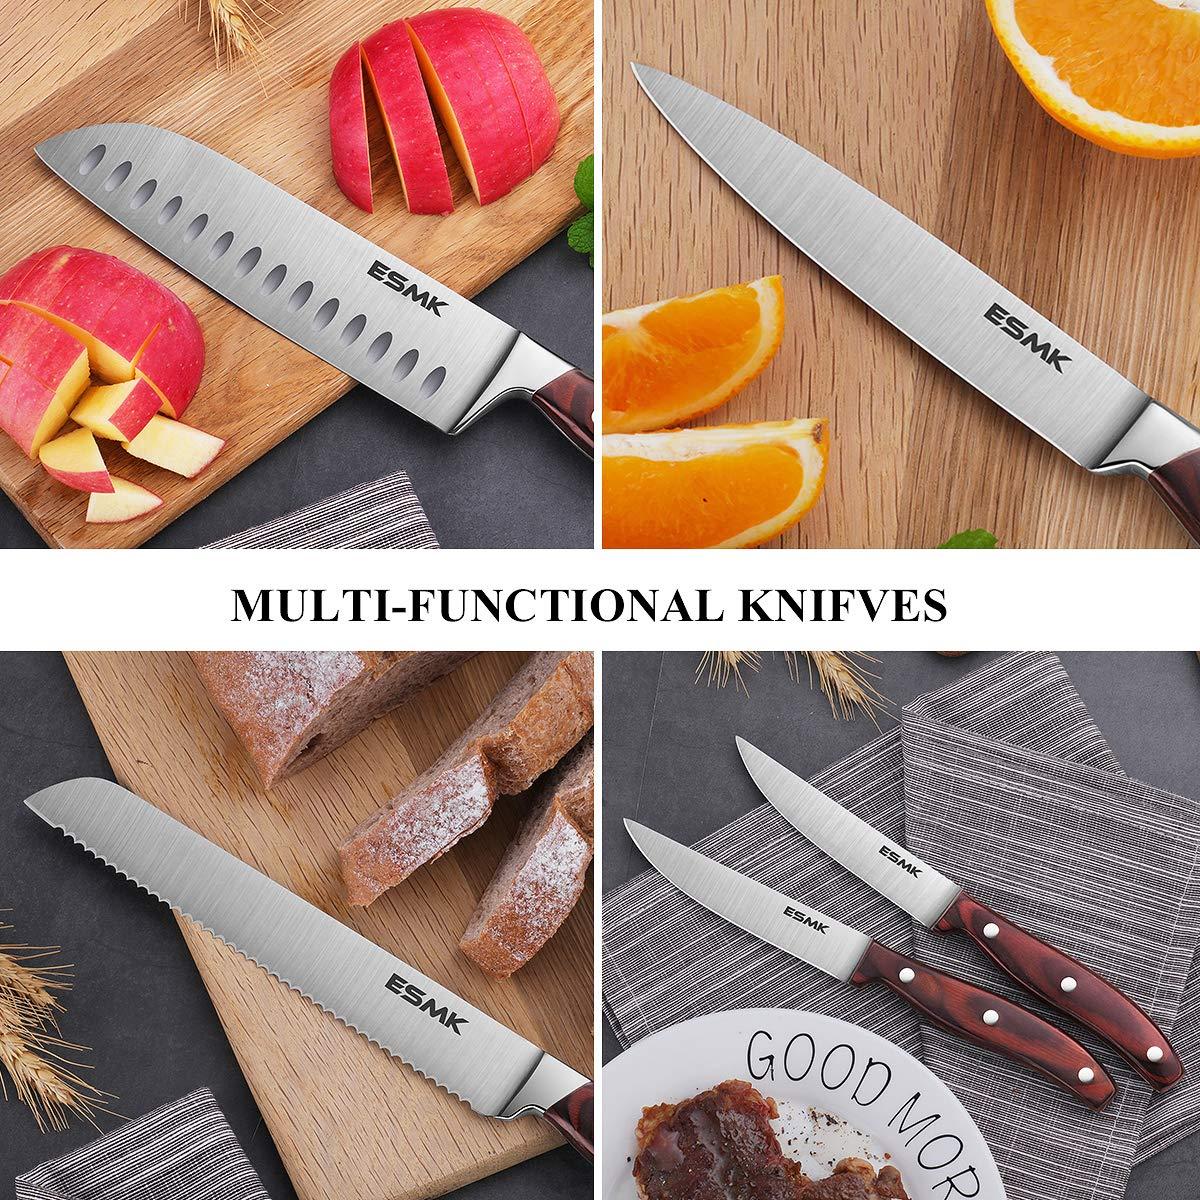 Knife Set, 15-Piece Kitchen Knife Set with Block Wooden, Manual Sharpening for Chef Knife Block Set, German Stainless Steel, ESMK (15 PCs Knife Block Set) by ESMK (Image #8)